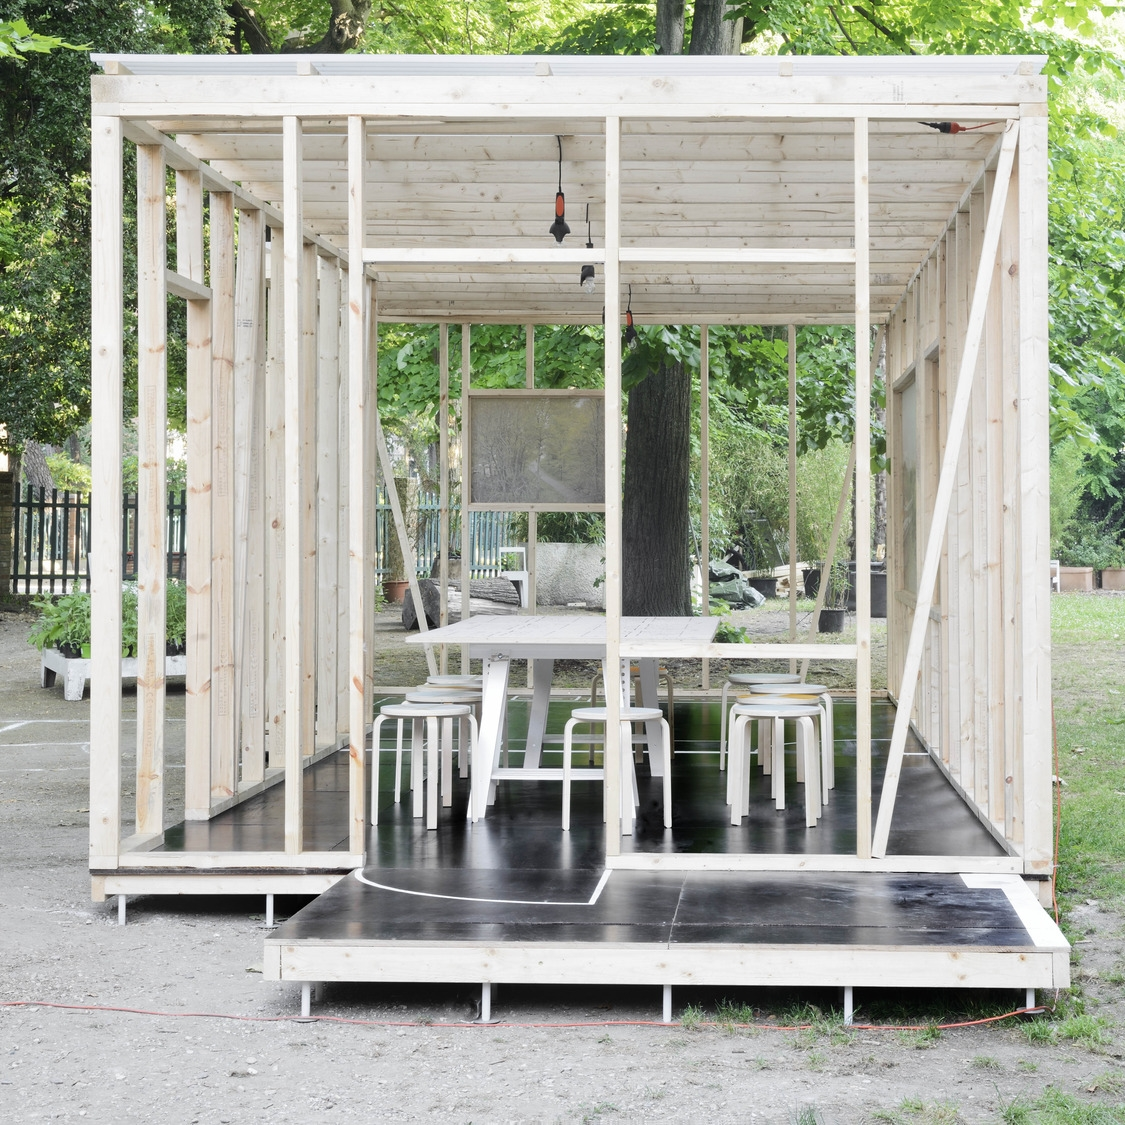 The Fittja Pavilion / Venice 2014